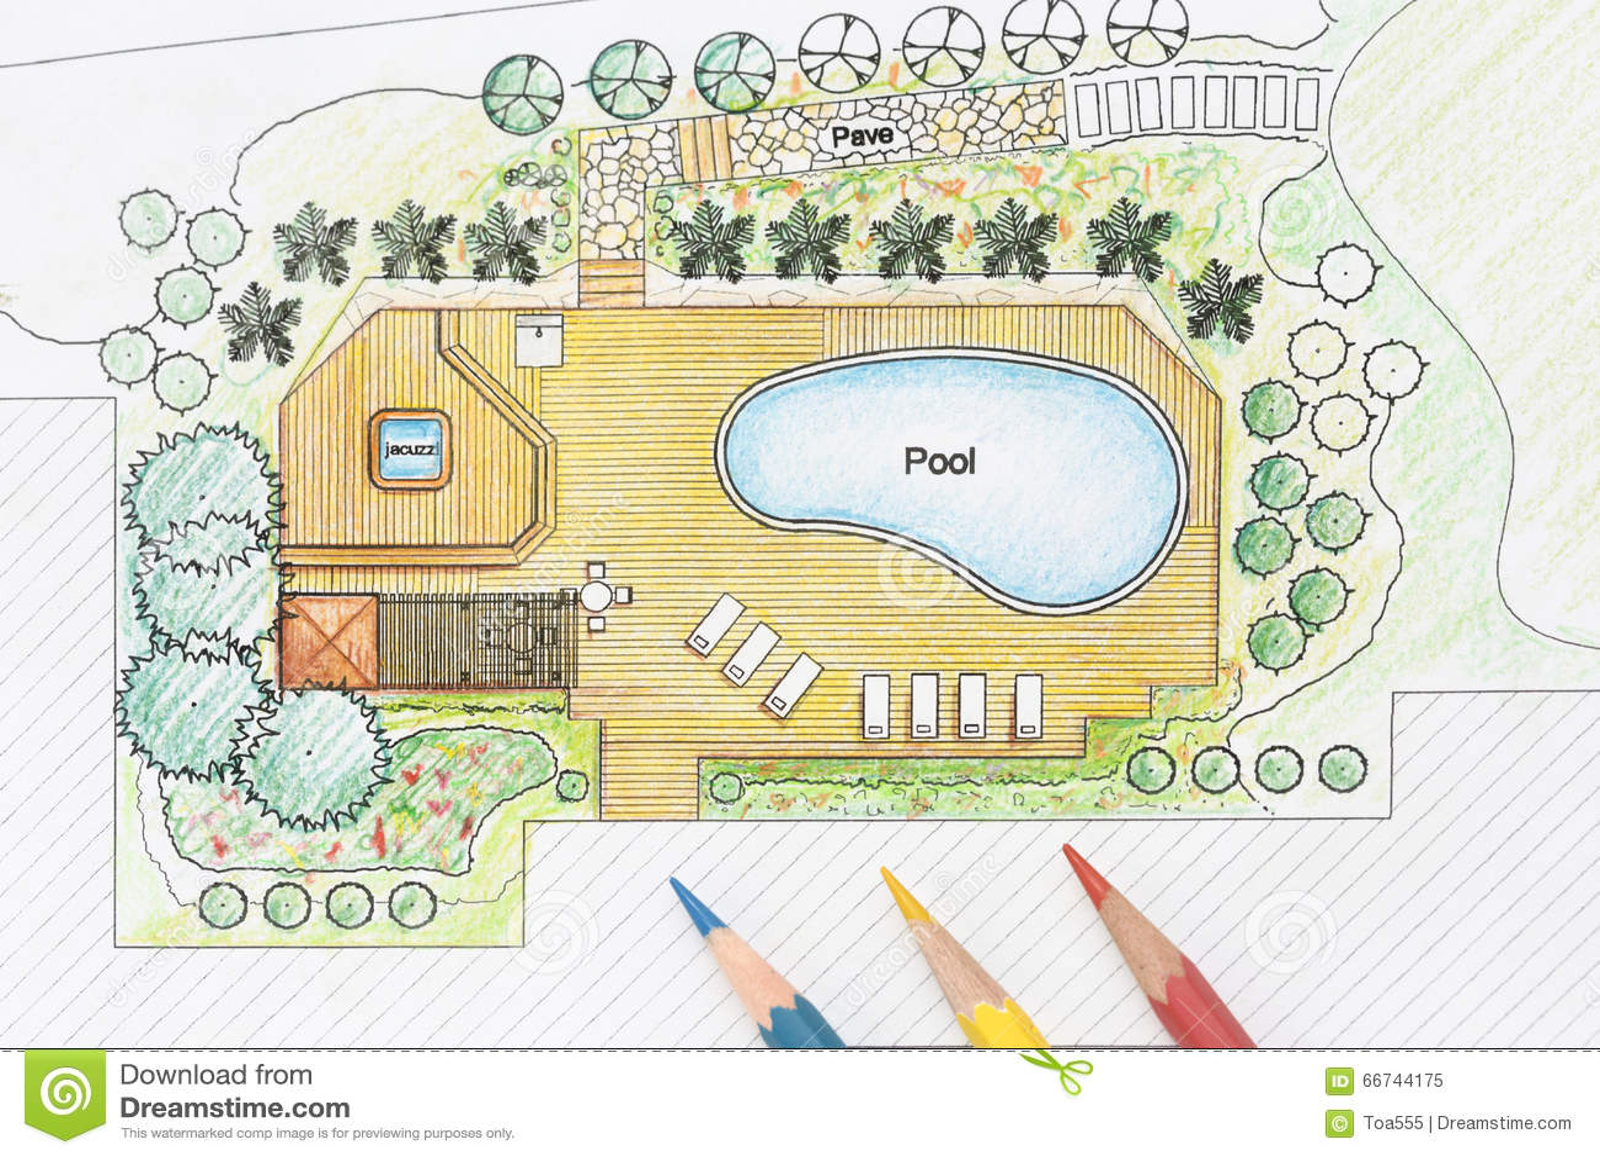 Landscape architect designs pool for luxury villa stock for Backyard garden designs plan